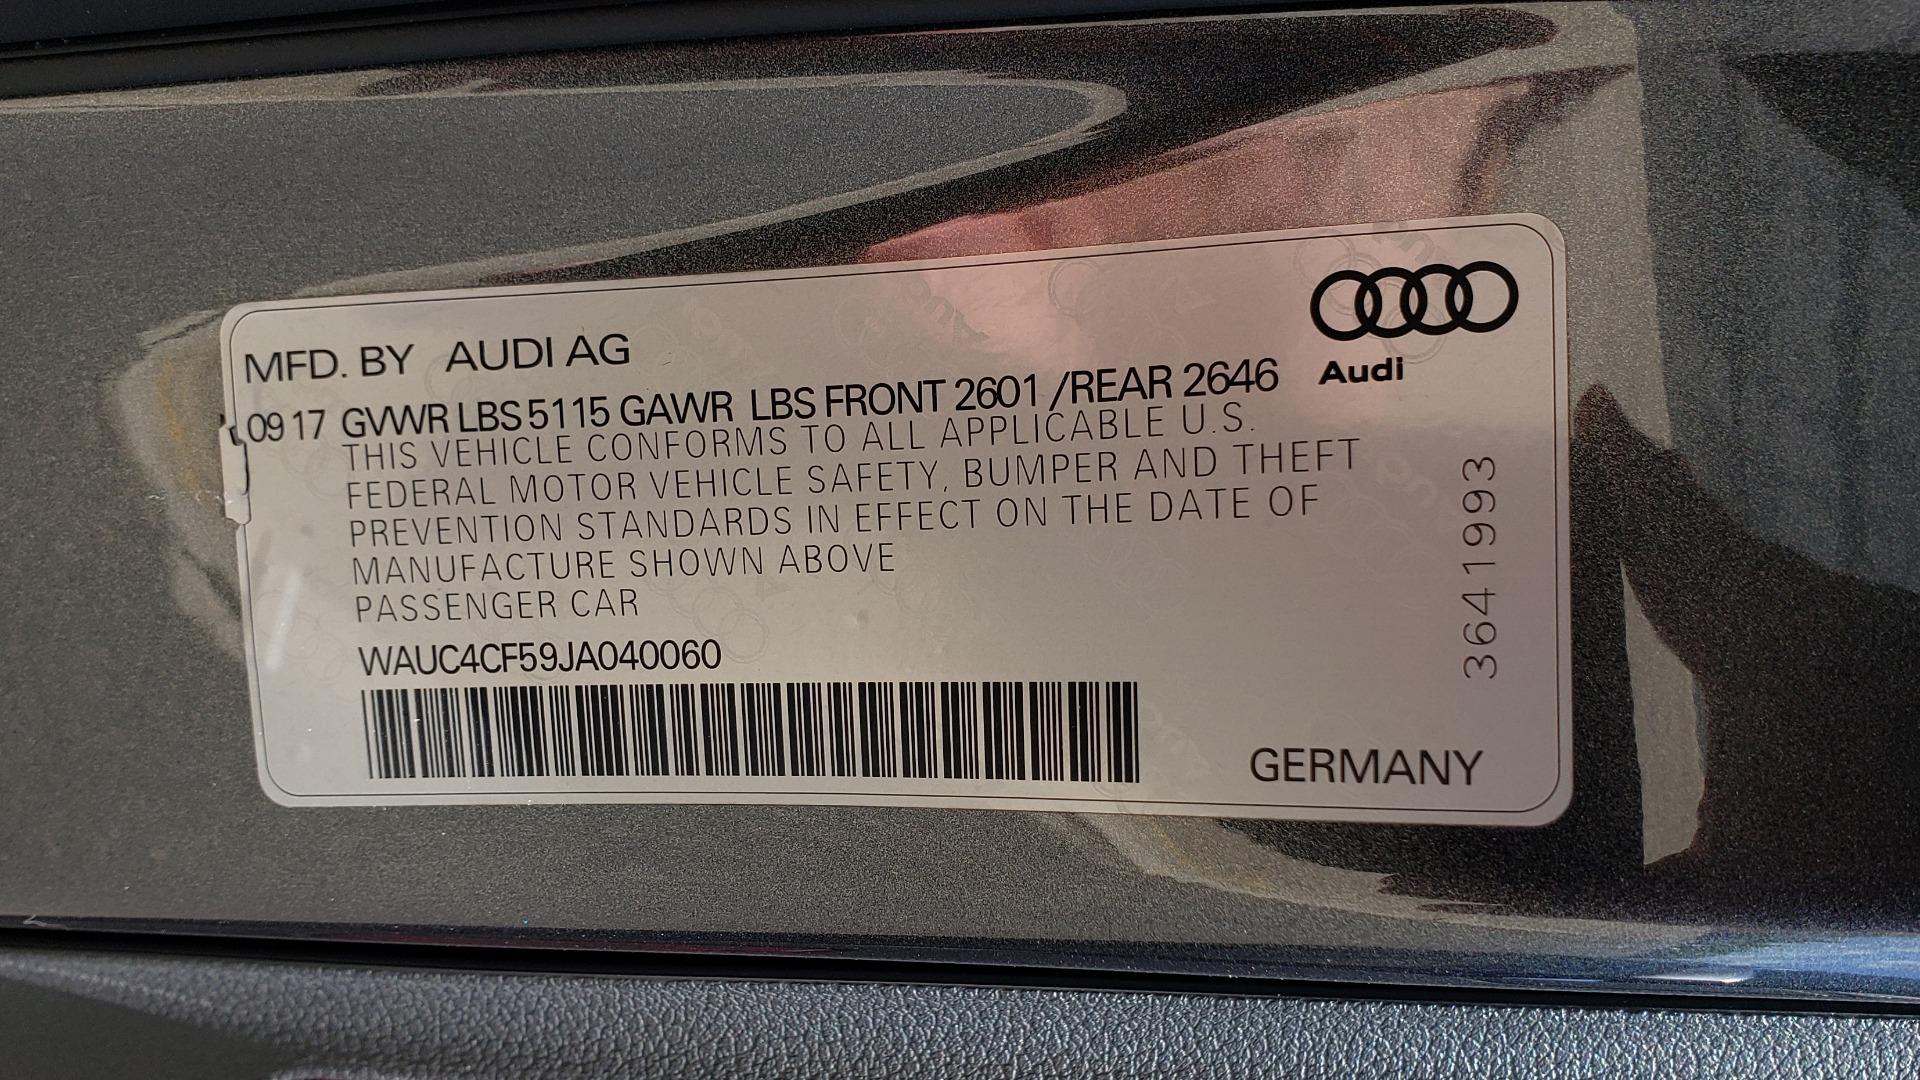 Used 2018 Audi S5 SPORTBACK PRESTIGE S-SPORT / NAV / SUNROOF / HUD / B&O SND / REARVIEW for sale $48,995 at Formula Imports in Charlotte NC 28227 81